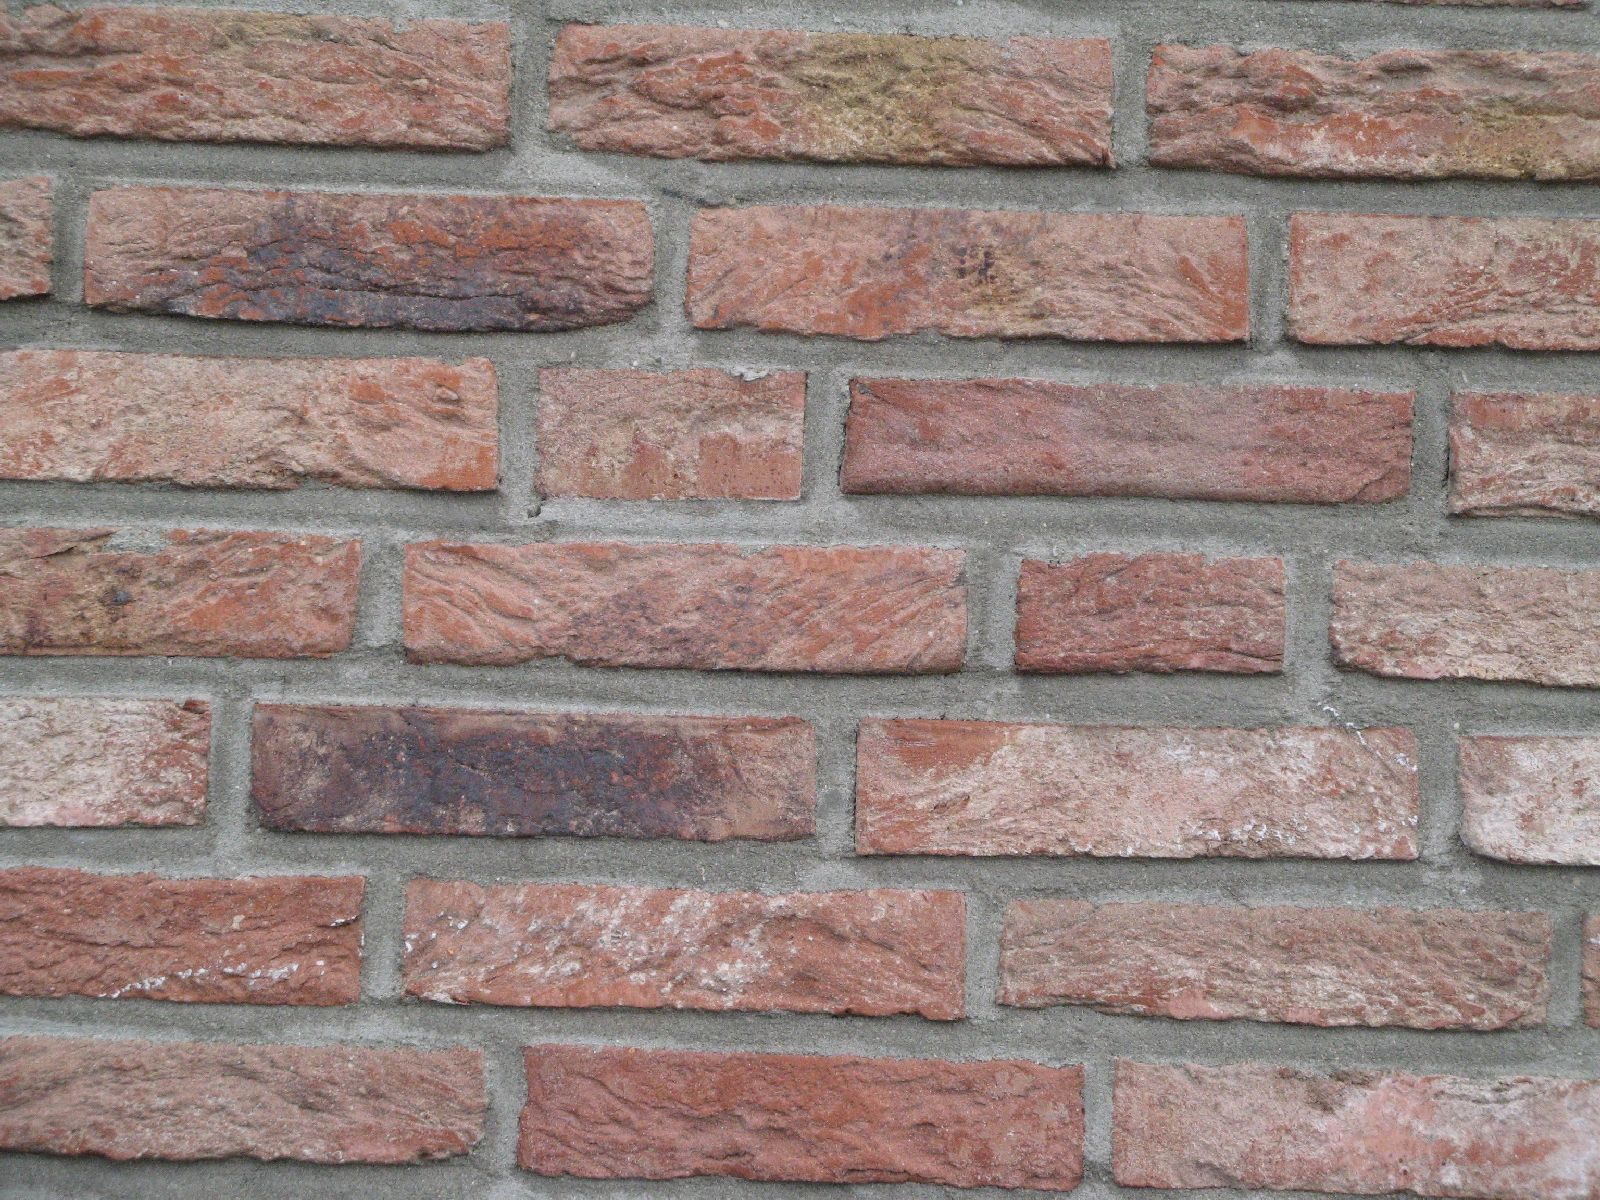 Brick_Texture_B_5843